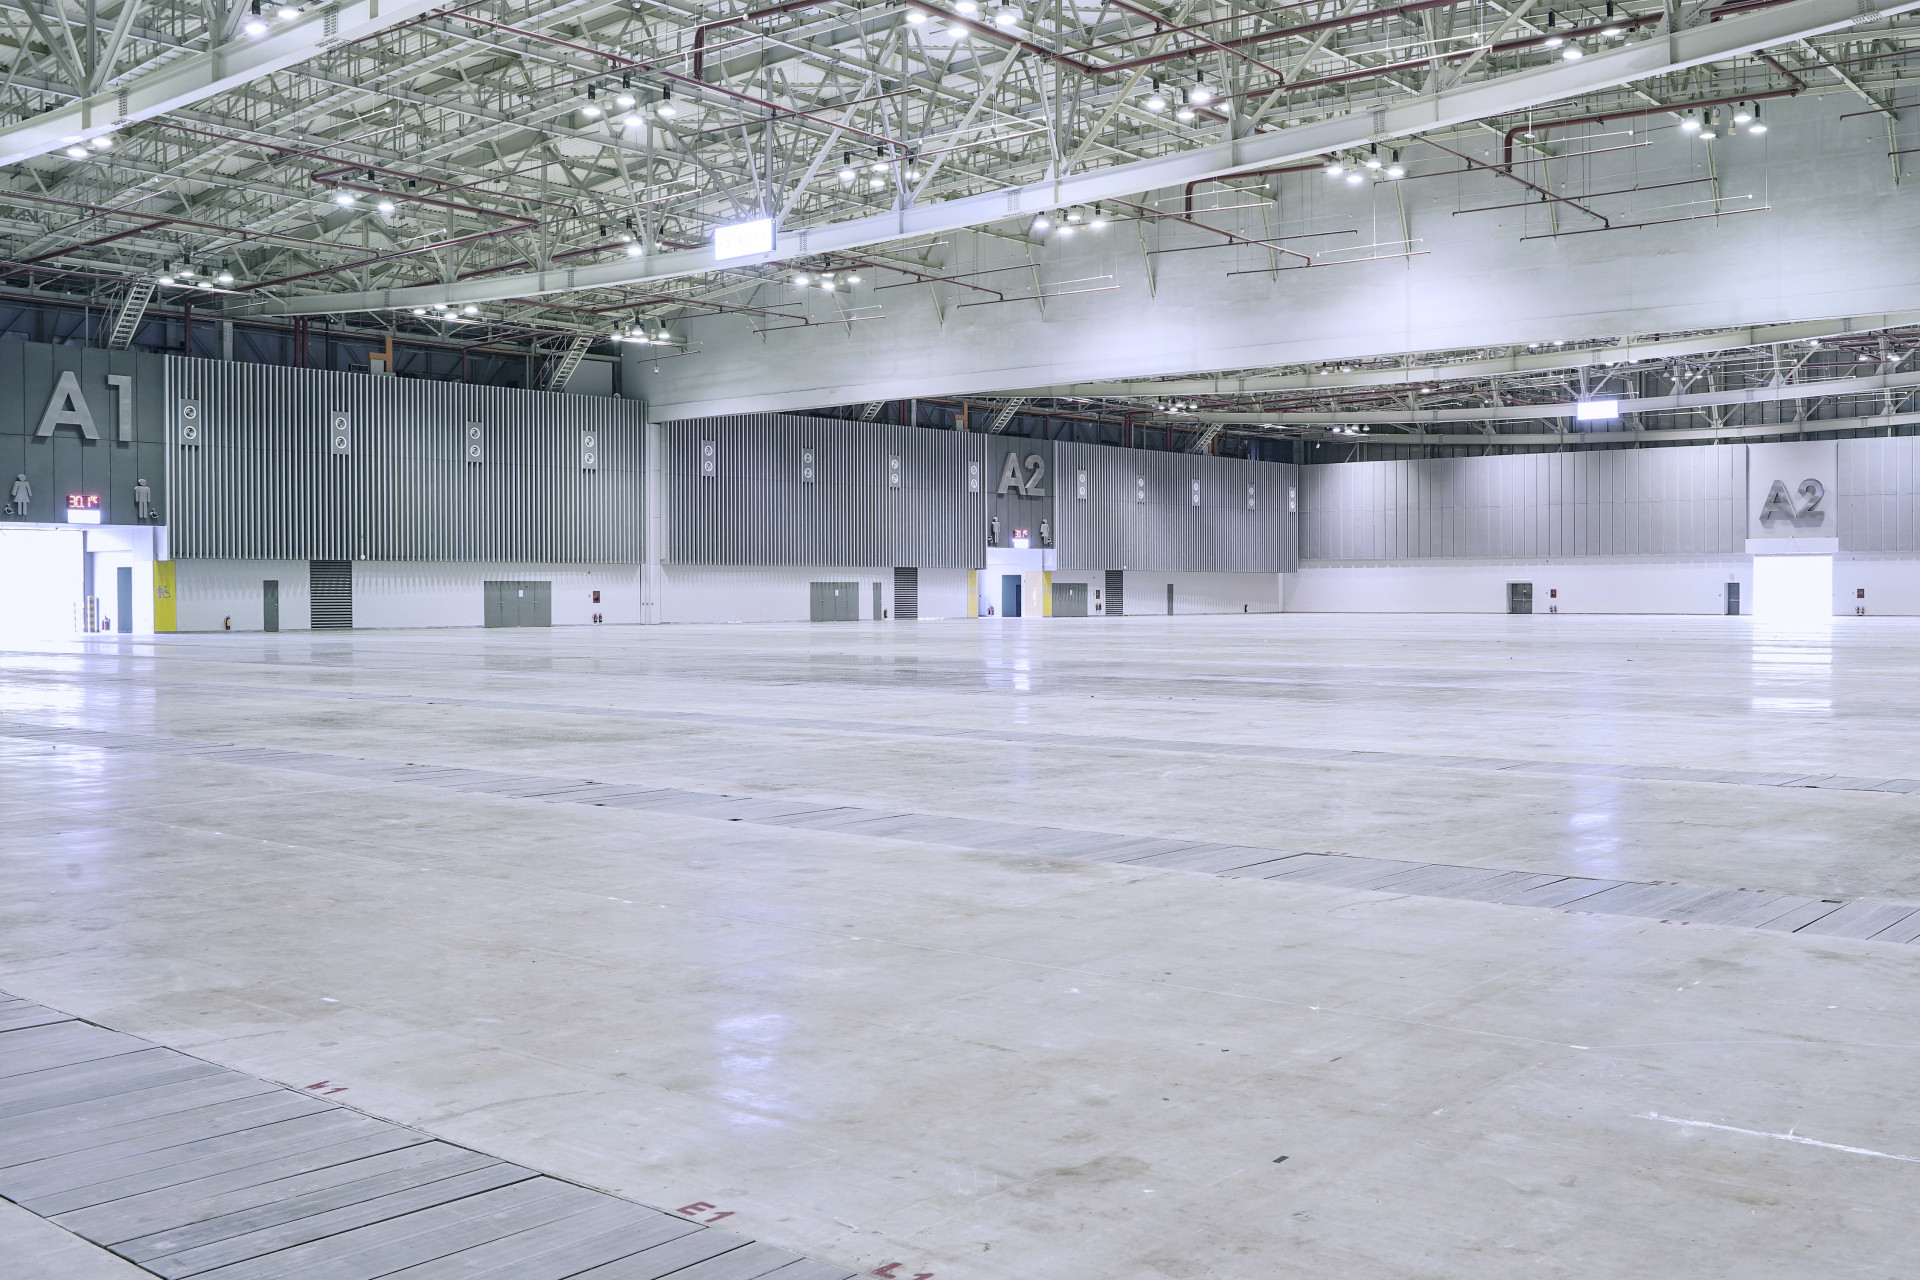 Exhibition Hall A1